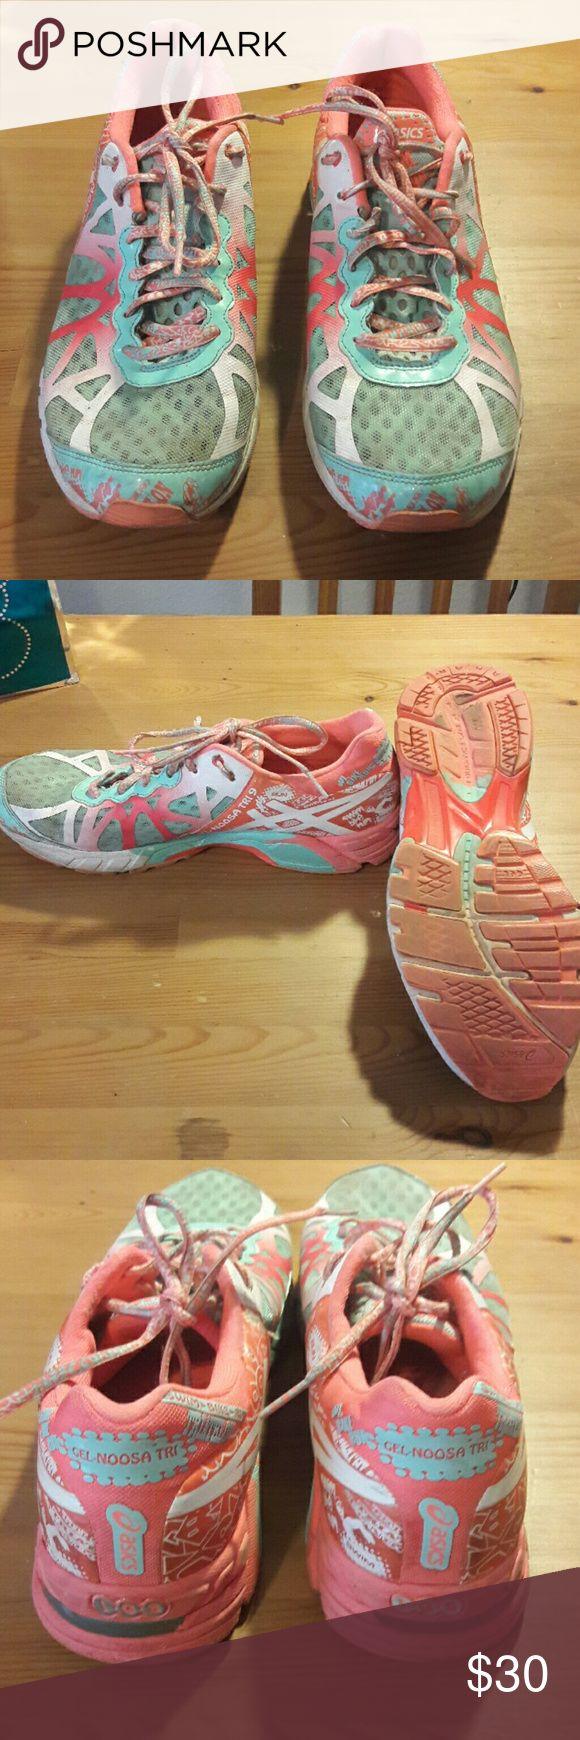 Asics gel noosa women's size 10 shoes Sporty shoes asics Shoes Athletic Shoes